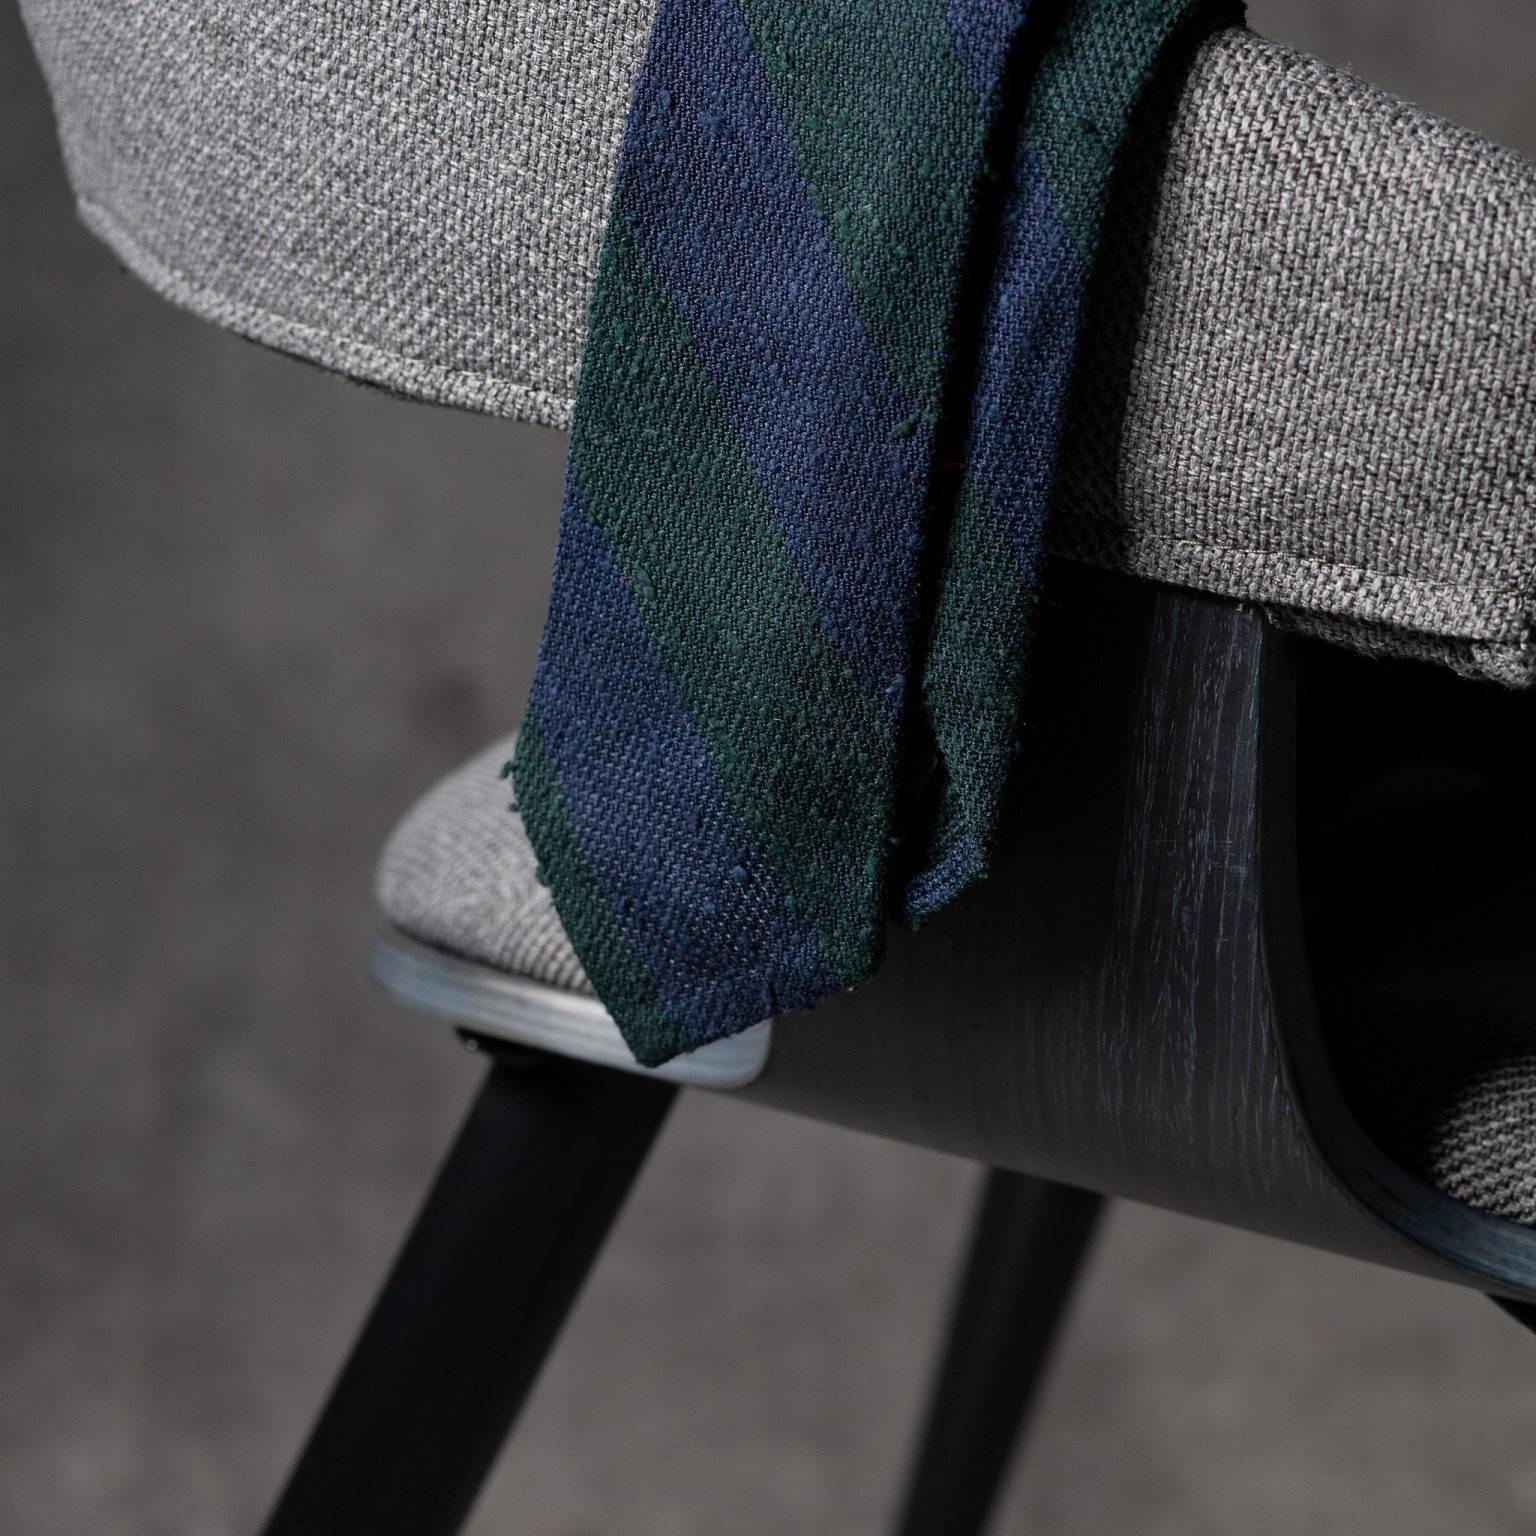 SHANTUNG-0271-Tie-Initials-Corbata-Iniciales-The-Seelk-2